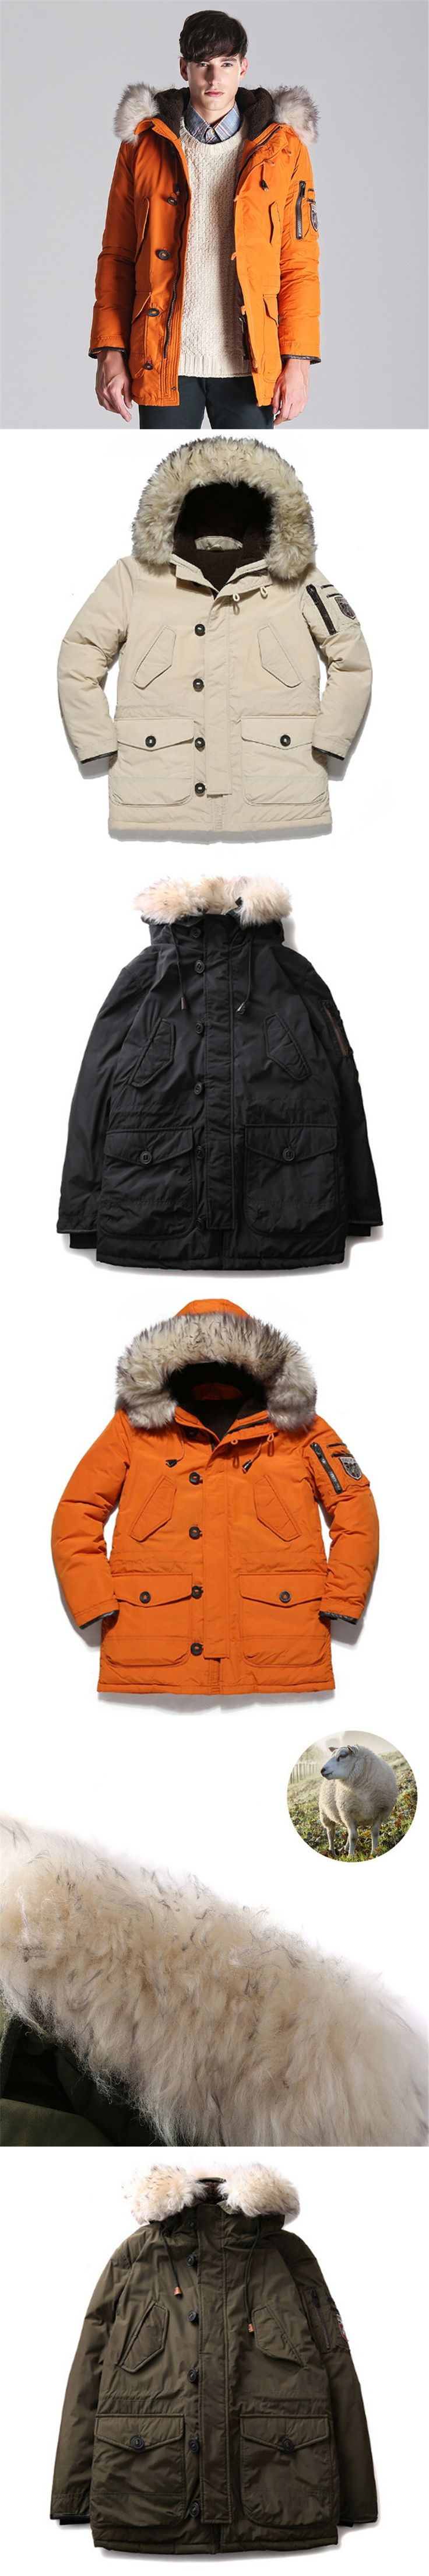 2018 winter white duck  mens parka jackets fur hood Army green Casual Warm  Men Coats Plus size 4XL